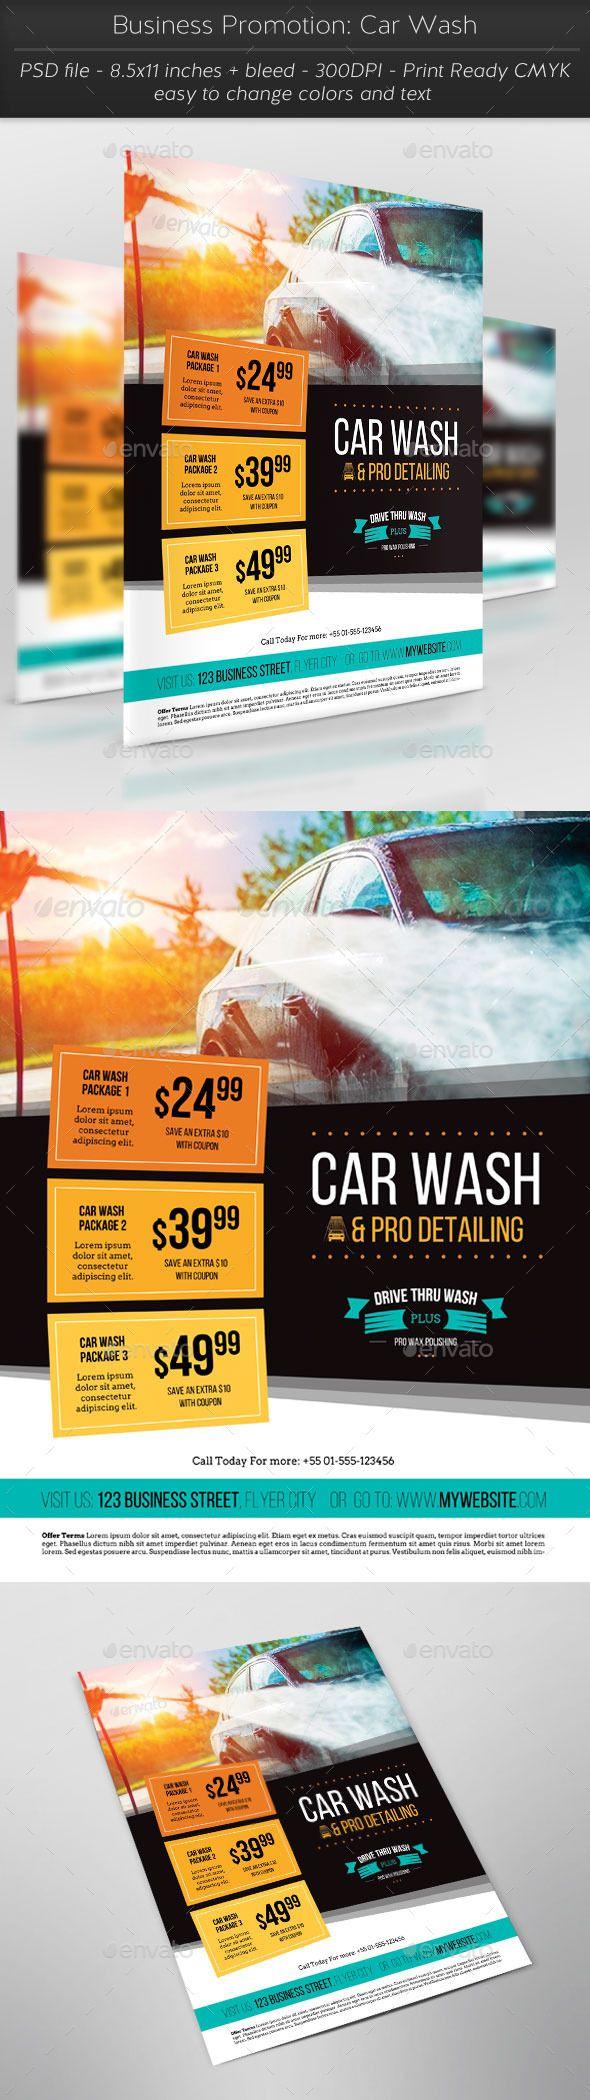 best images about flyer design restaurant business promotion car wash